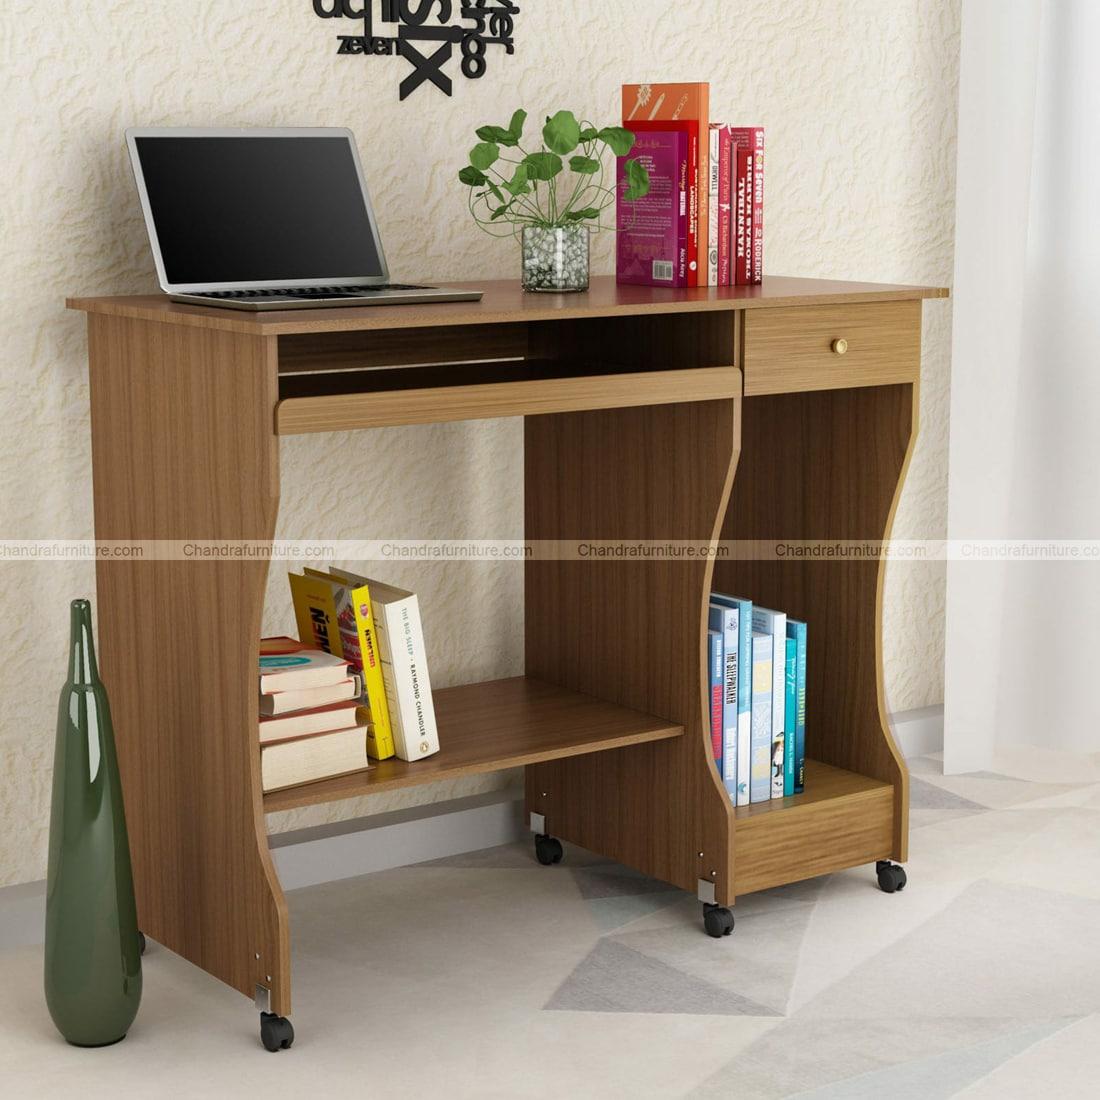 Chandra Furniture Zenith Computer Table In Teak Finish